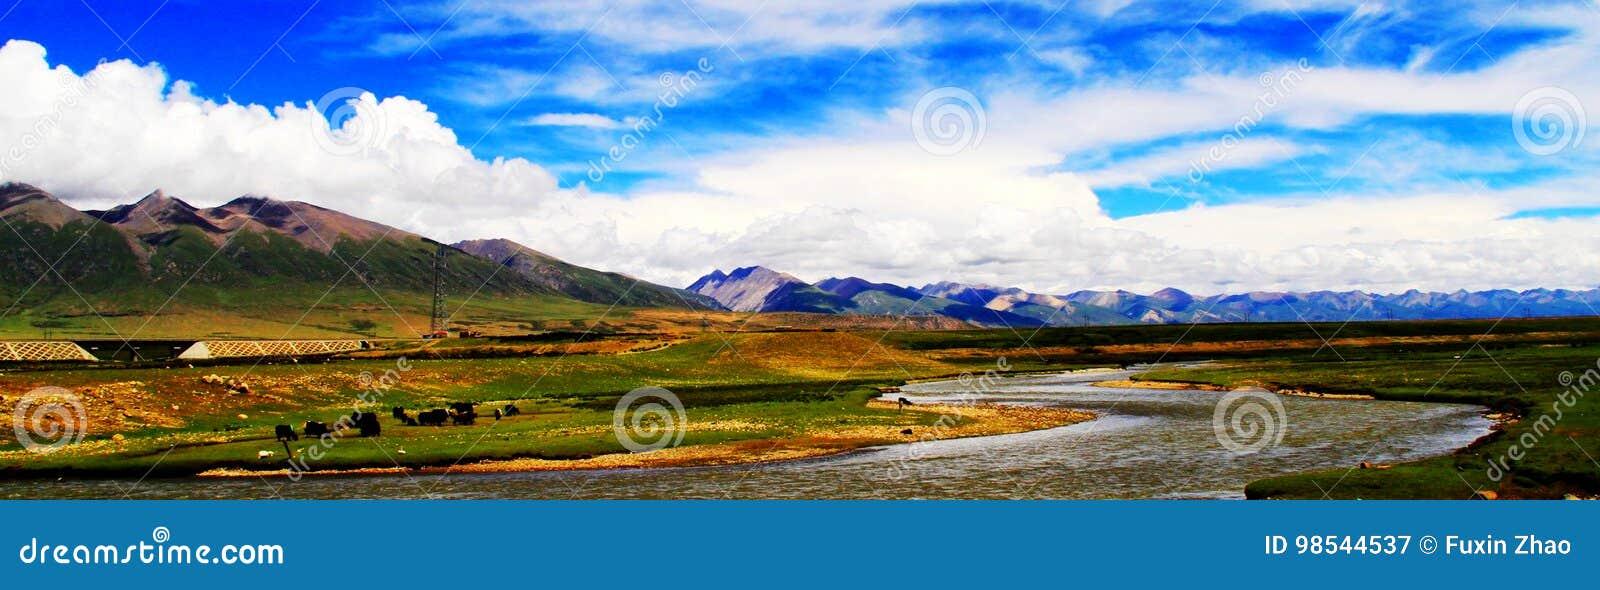 China`s Tibet, Northern Tibet grassland